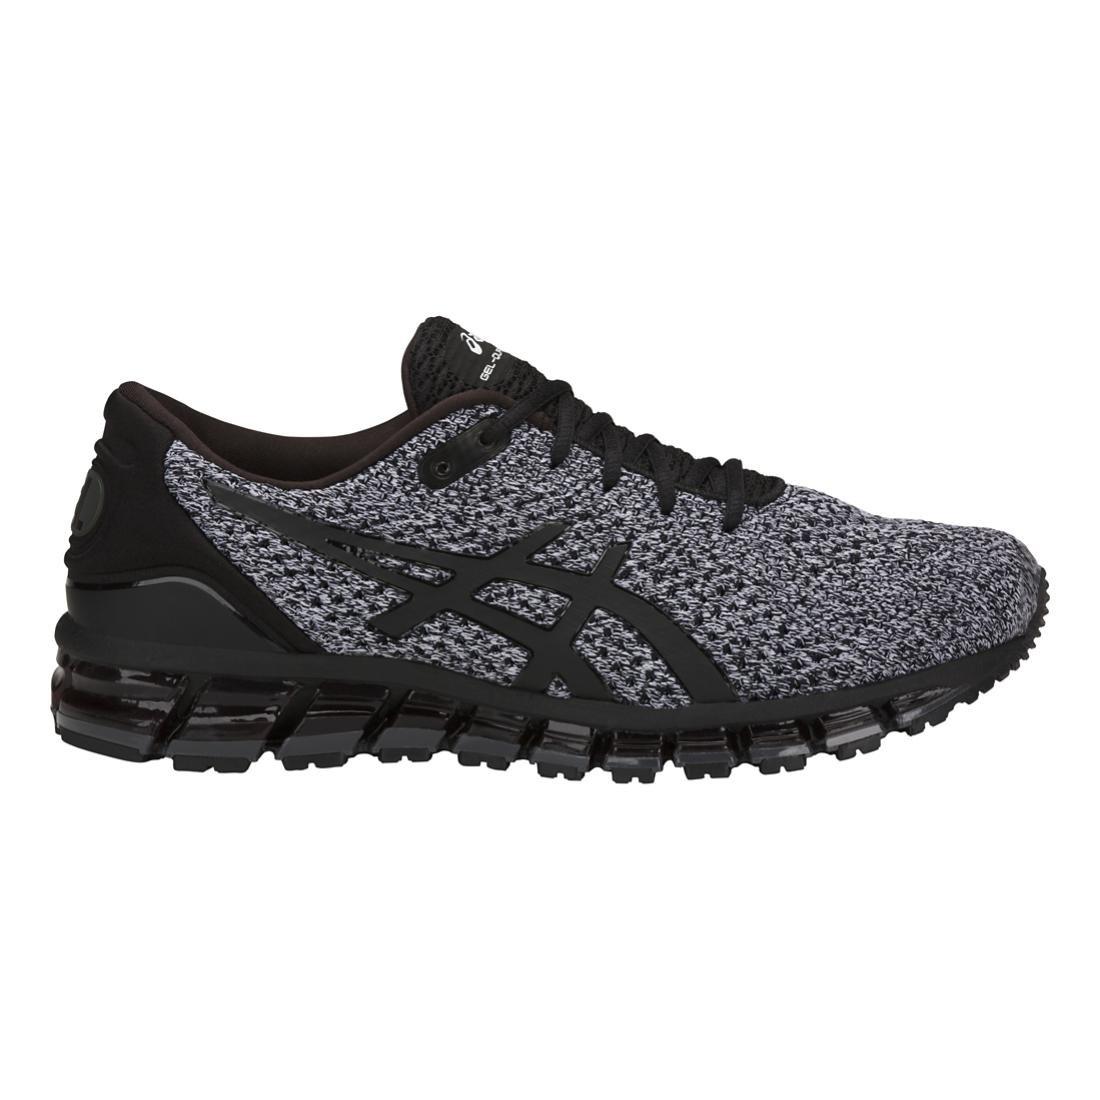 Gel-Quantum 360 Knit Men's Running Shoe B077H2ZCYX 7.5 D(M) US|Black/White/Black